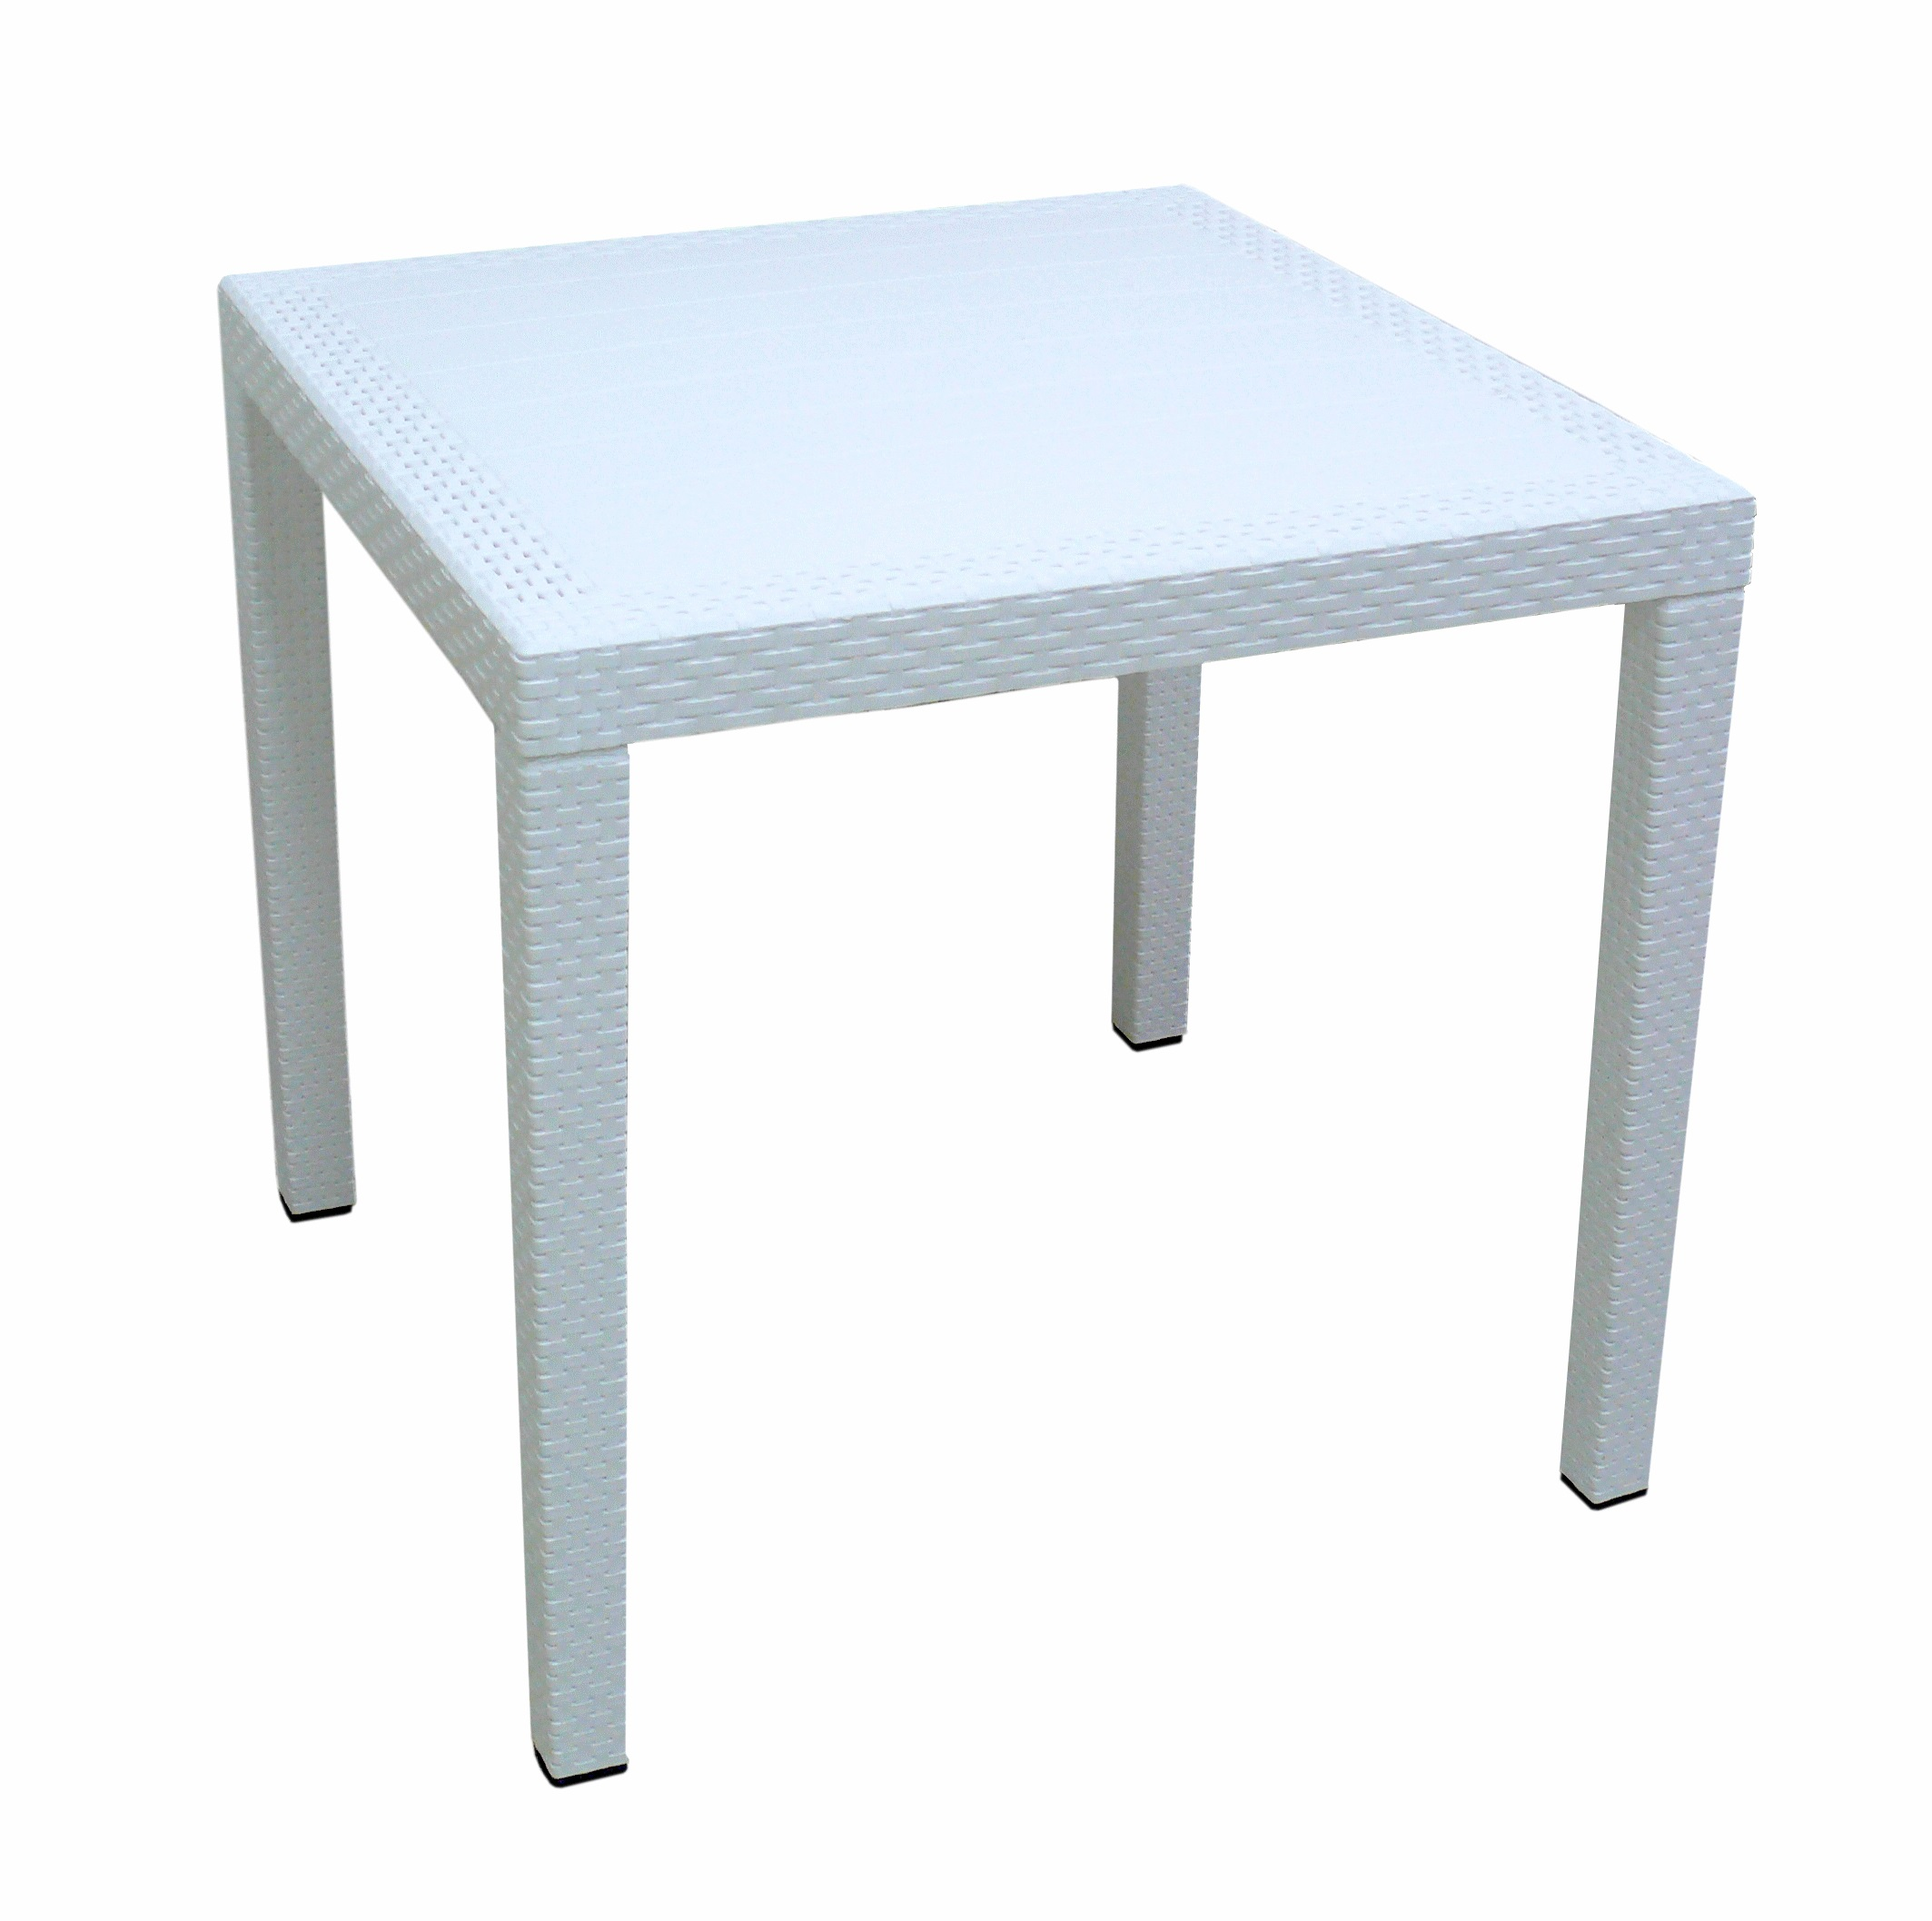 Levně KASVO RATAN LUX stůl polyratan 71x75,5x75,5 Okrová